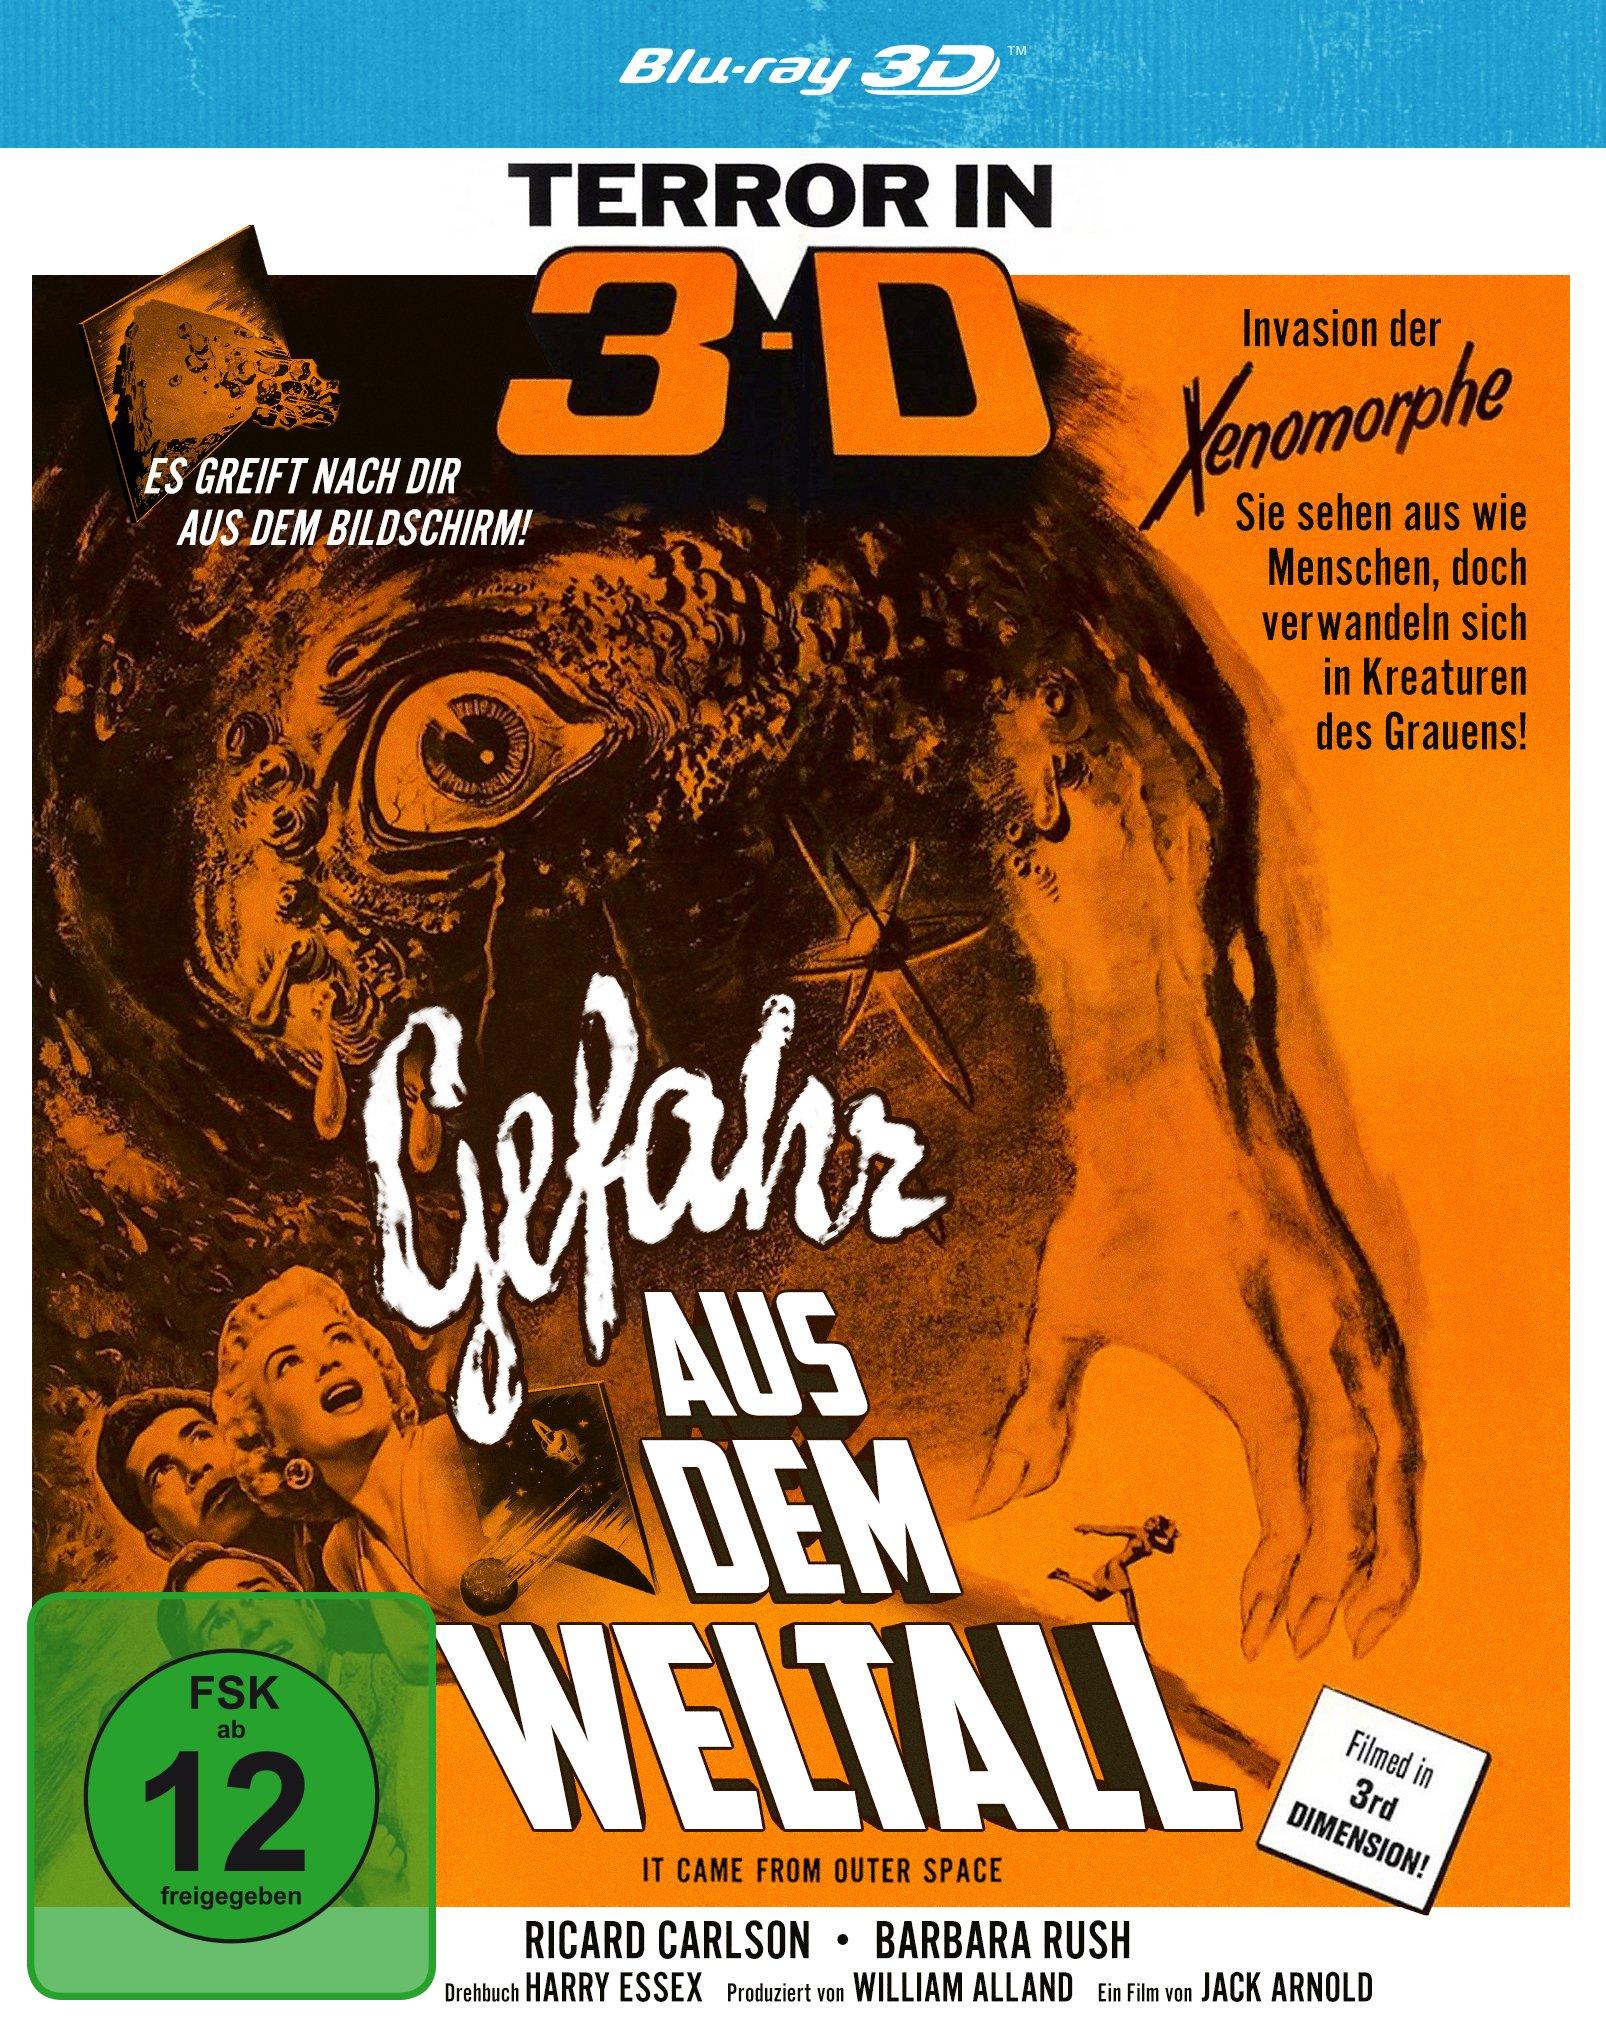 Gefahr.aus.dem.Weltall.3D.1953.German.DL.720p.BluRay.x264-LizardSquad